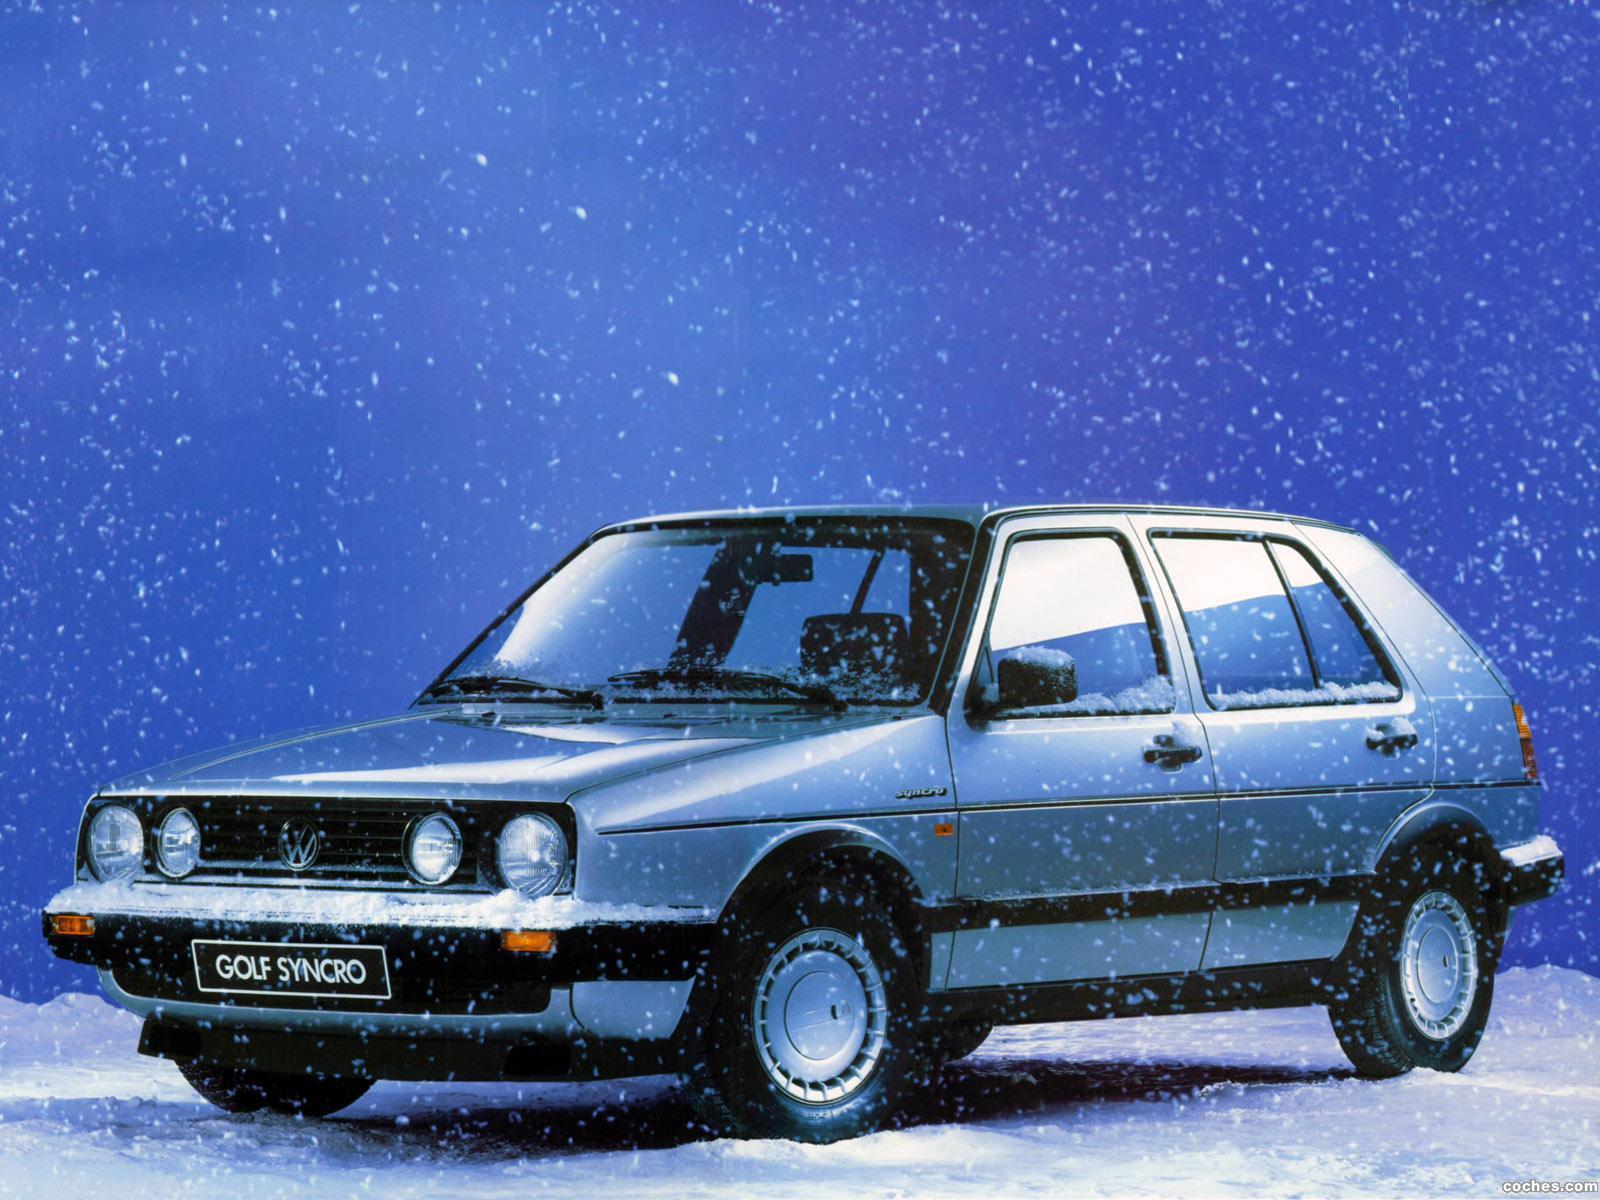 Foto 0 de Volkswagen Golf GT Syncro 5 Puertas 1987